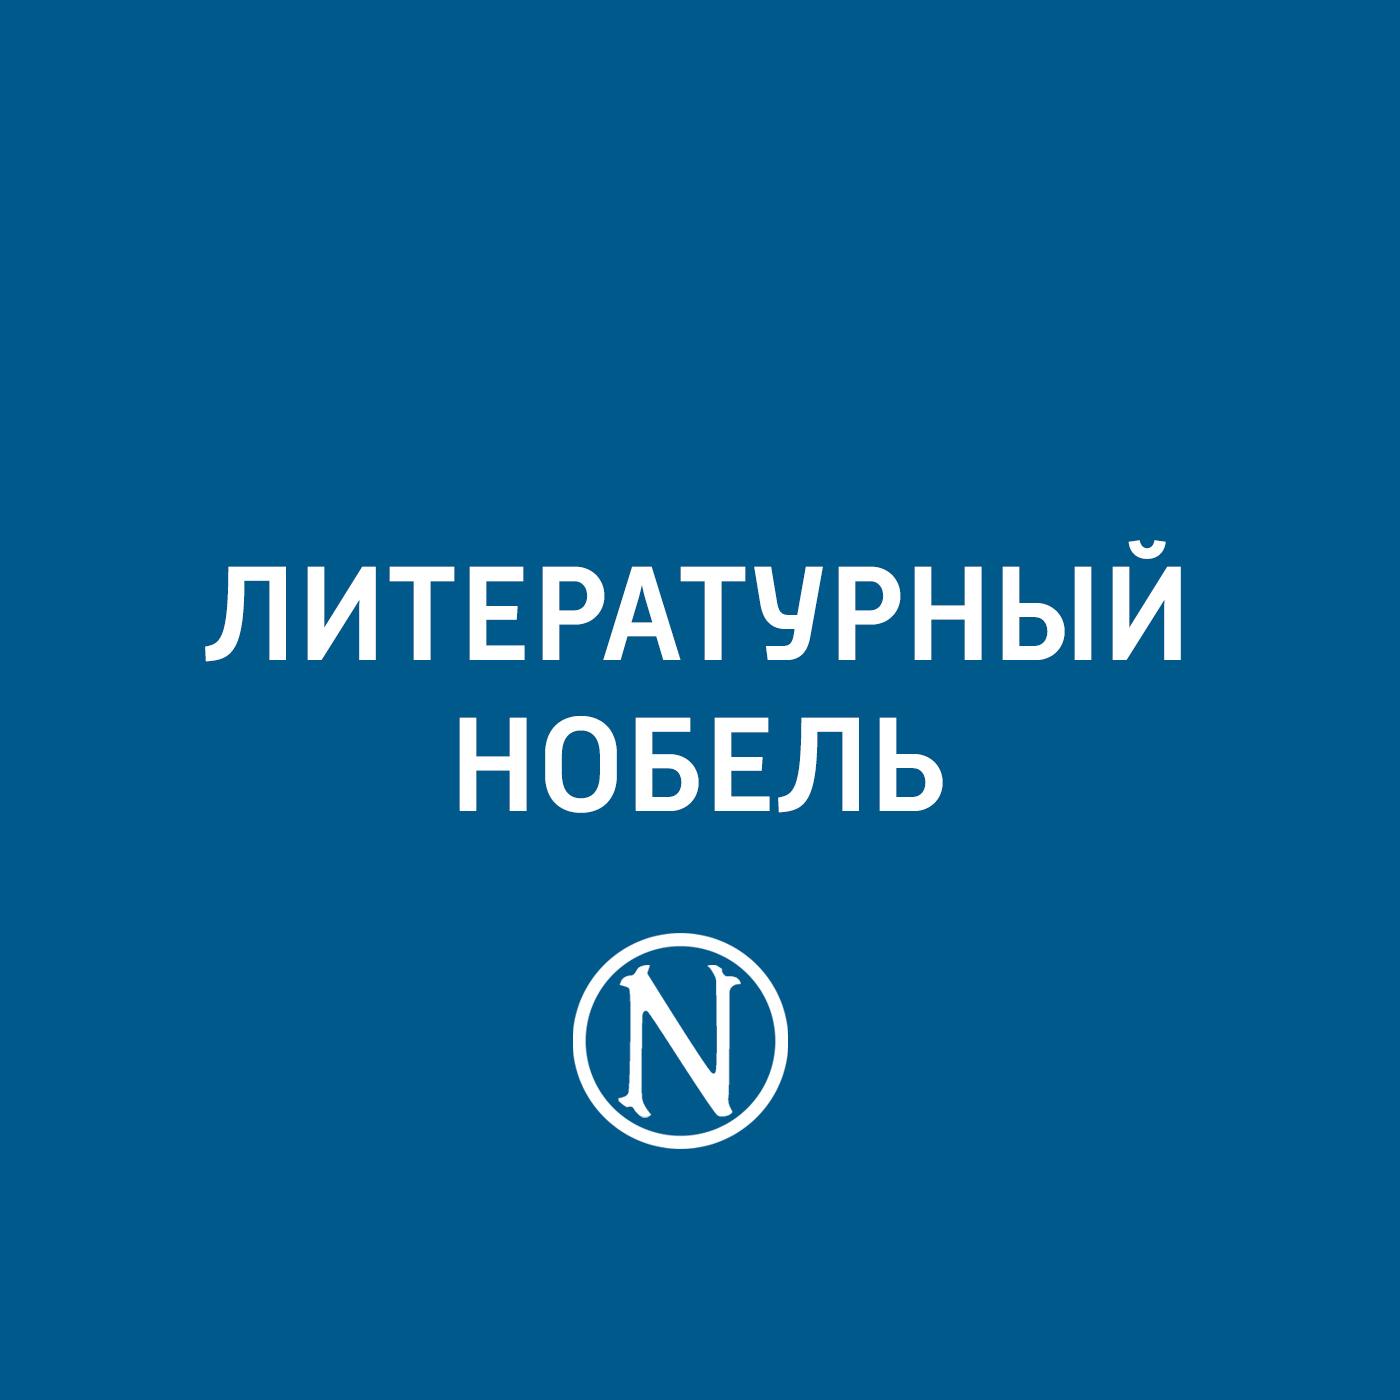 Евгений Стаховский Кнут Гамсун евгений стаховский кнут гамсун